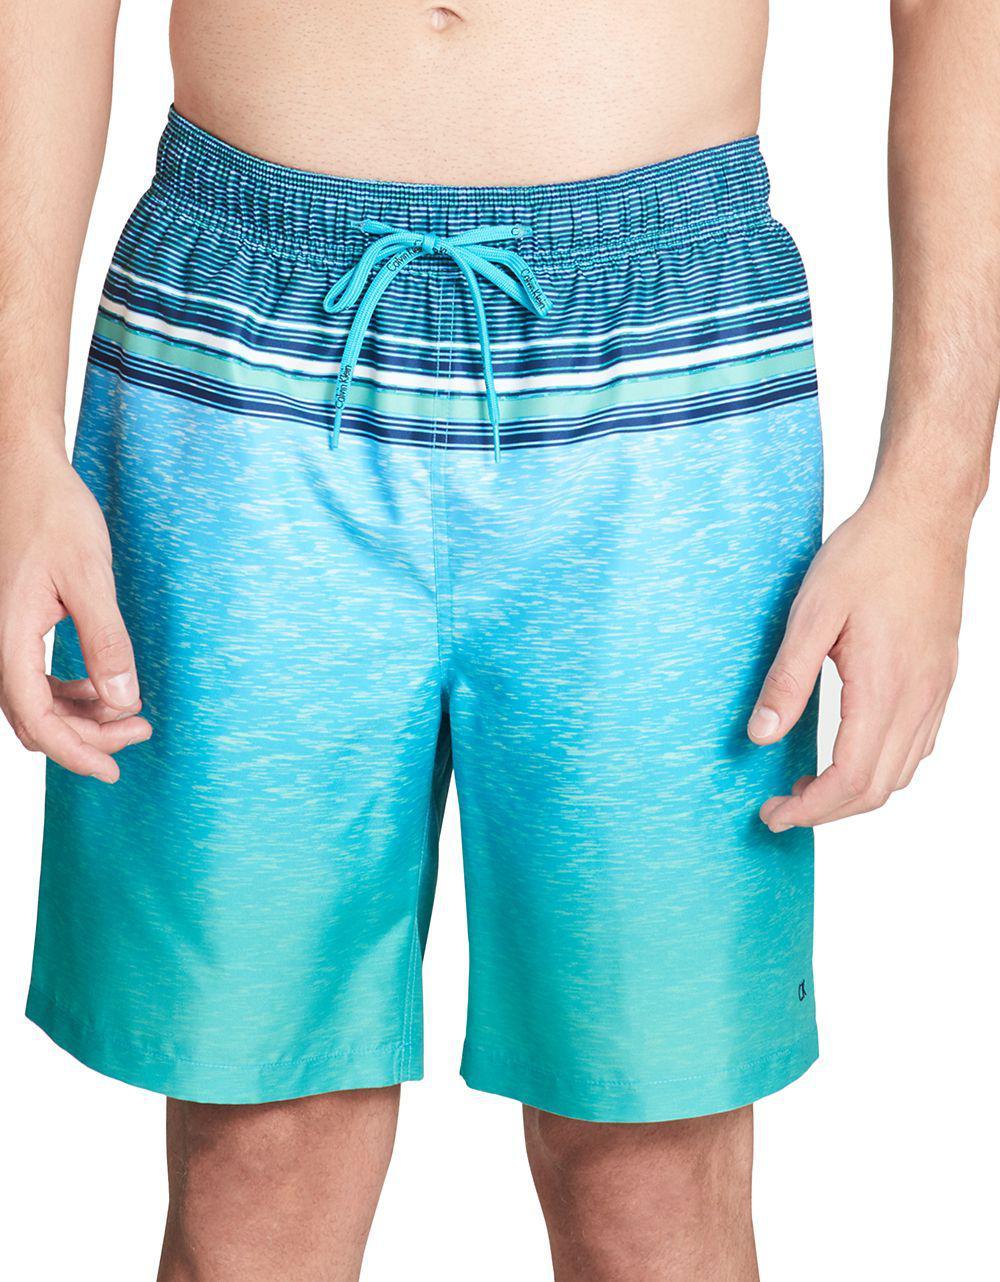 f160469846652c Lyst - Calvin Klein 205W39Nyc Graphic Swim Shorts in Blue for Men